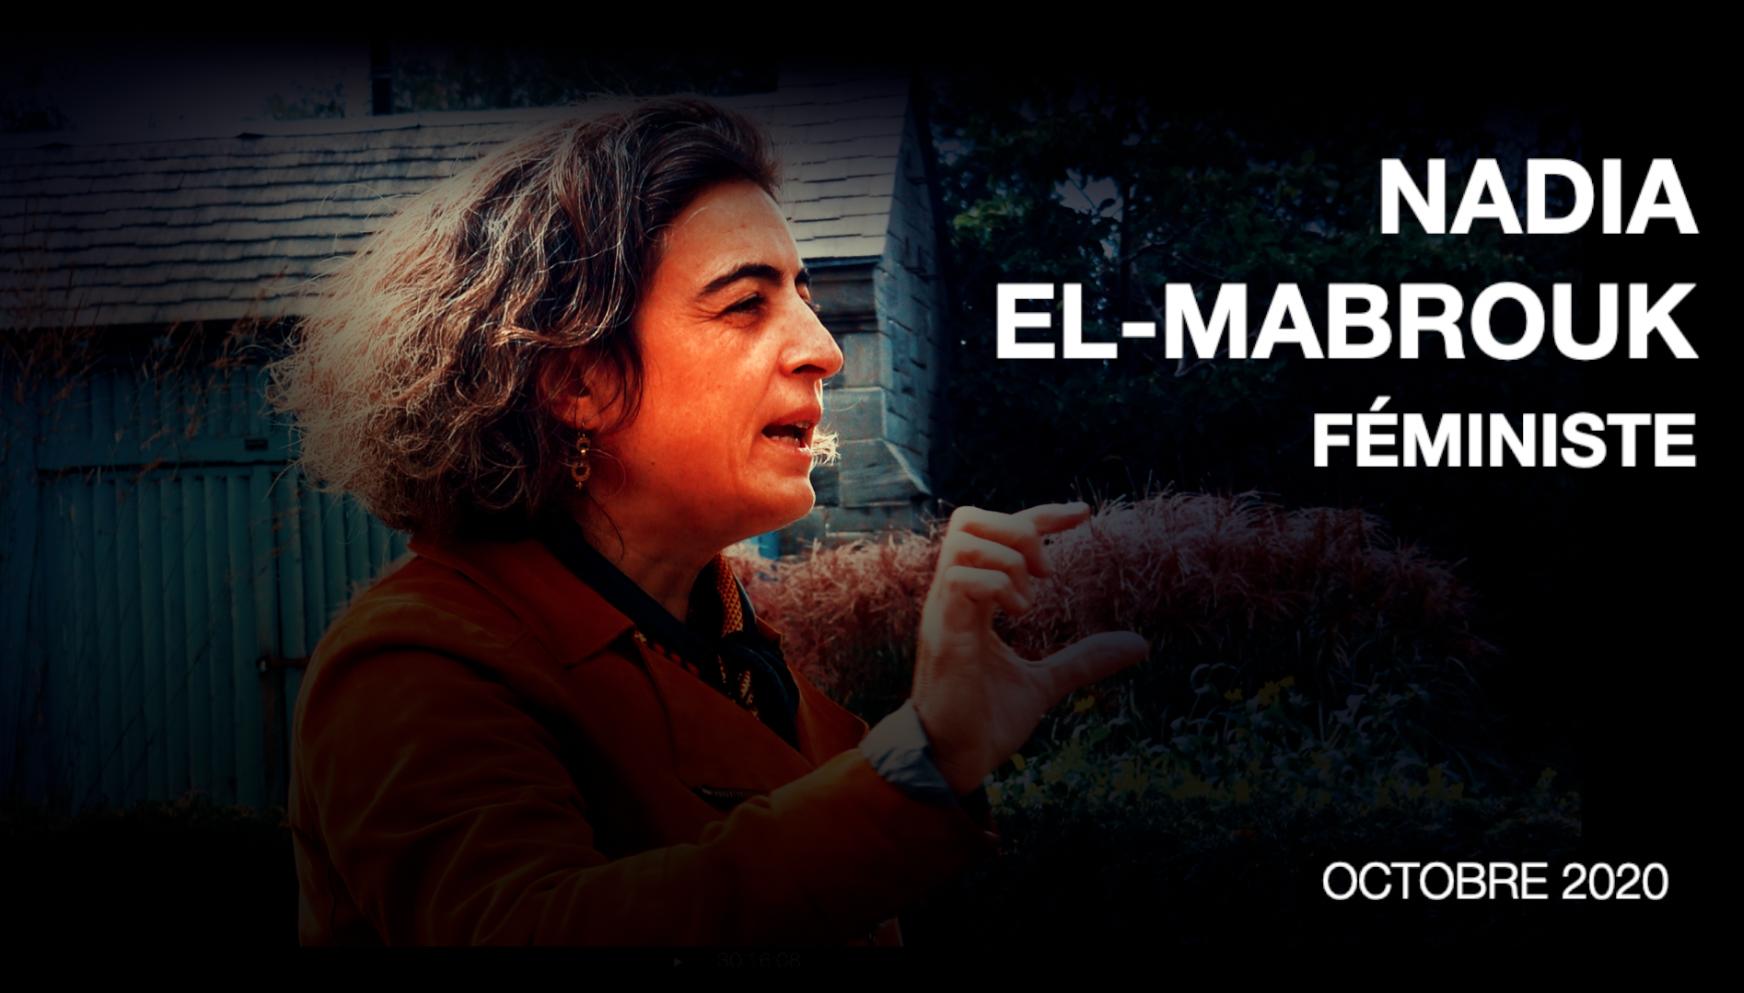 Nadio El-Mabrouk